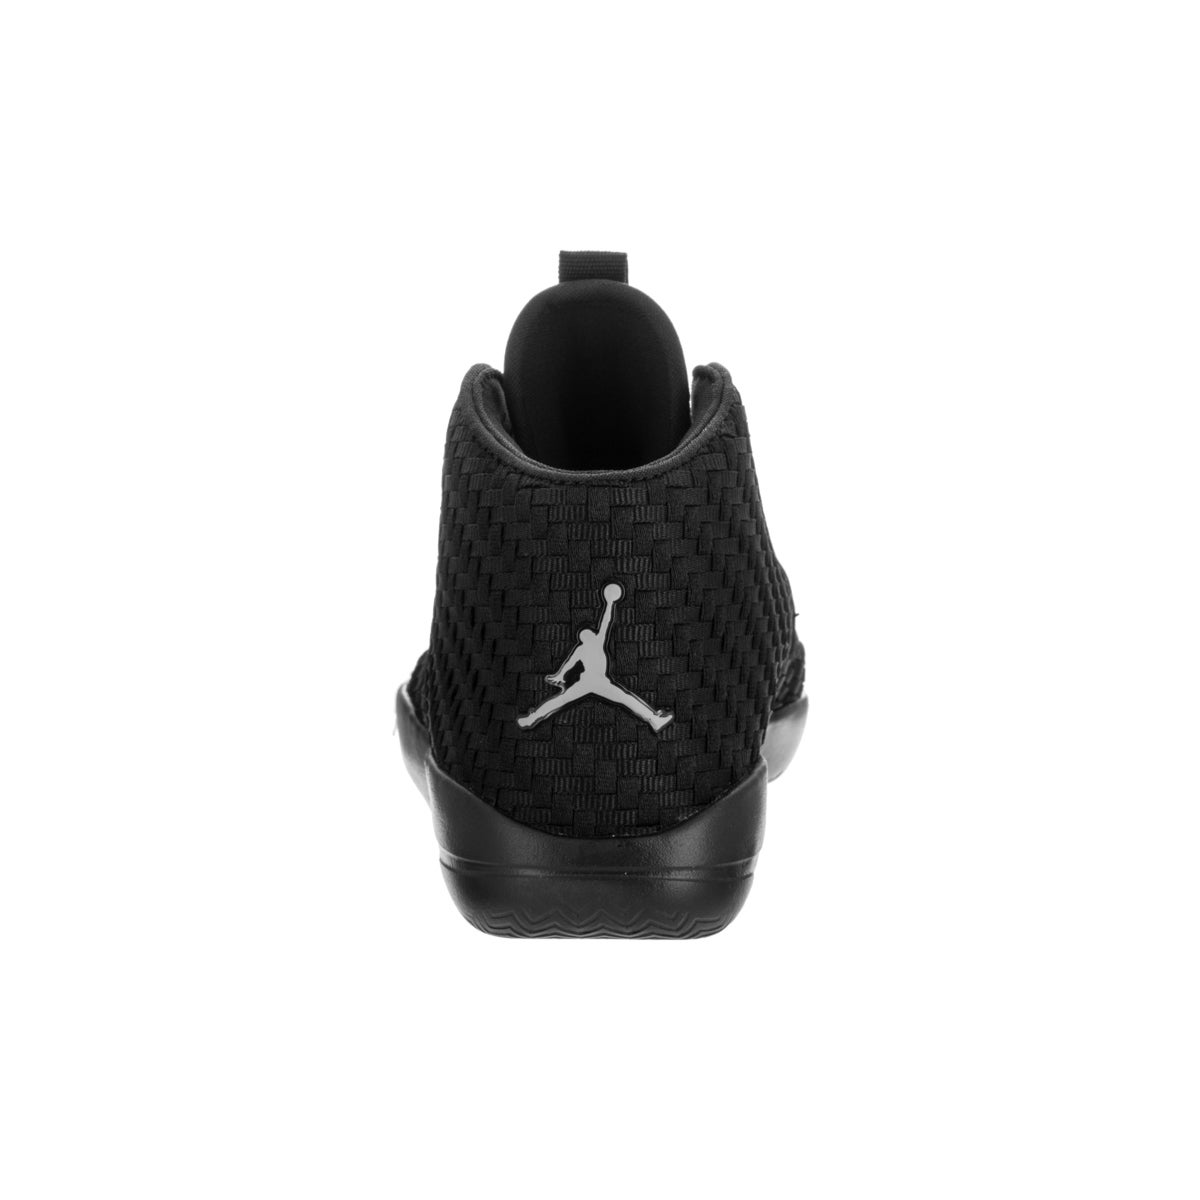 55c5ef5128e Shop Nike Jordan Kids Jordan Eclipse Chukka Basketball Shoes - Free  Shipping Today - Overstock - 14746677